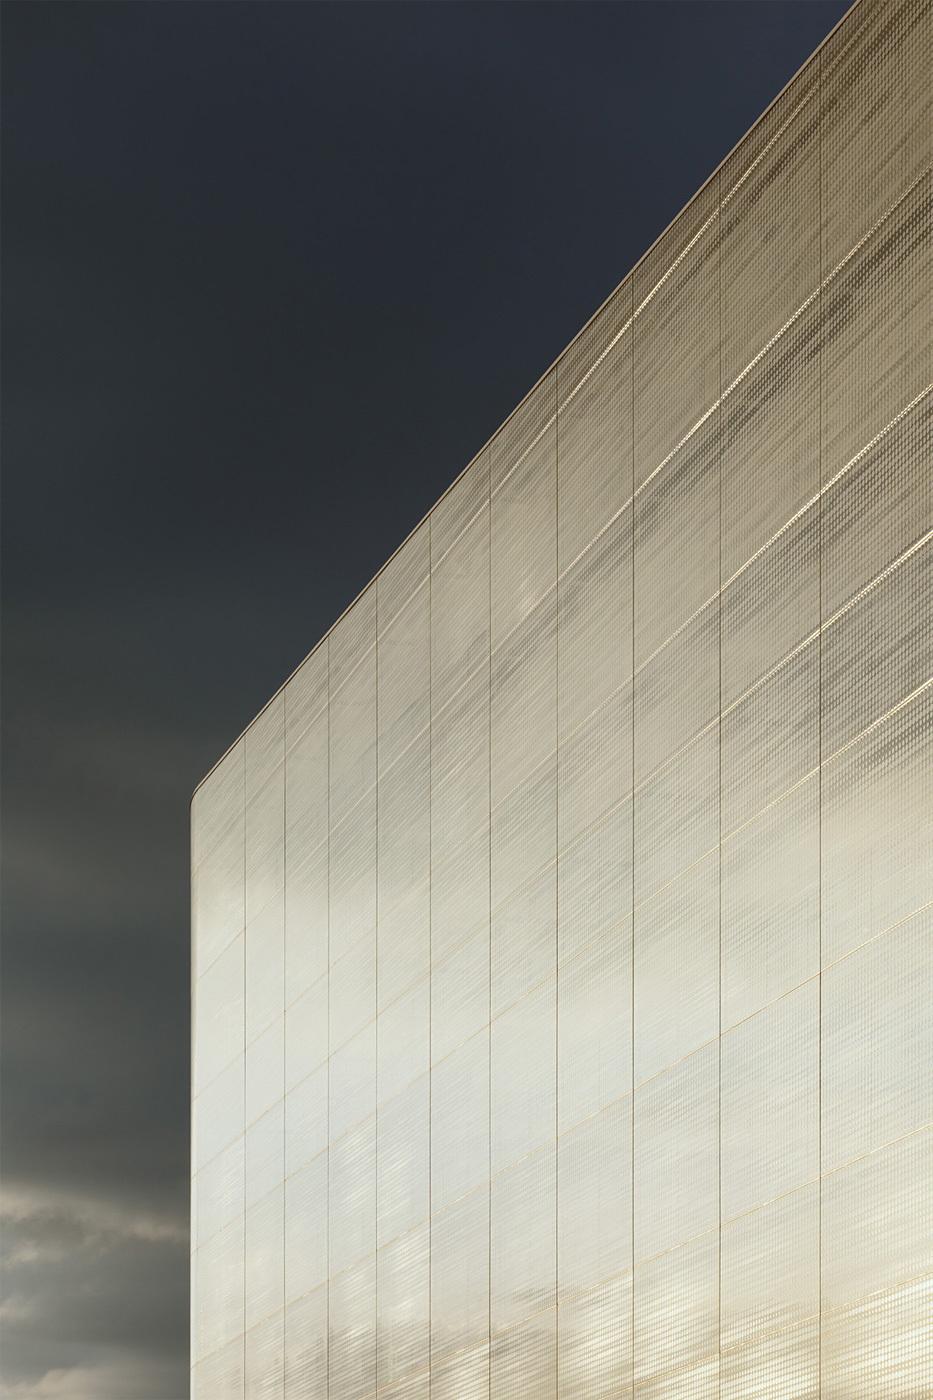 Kulturbau 'Forum Confluentes' in Koblenz, Germany by Benthem Crouwel Architects; Photo: Thomas Eicken